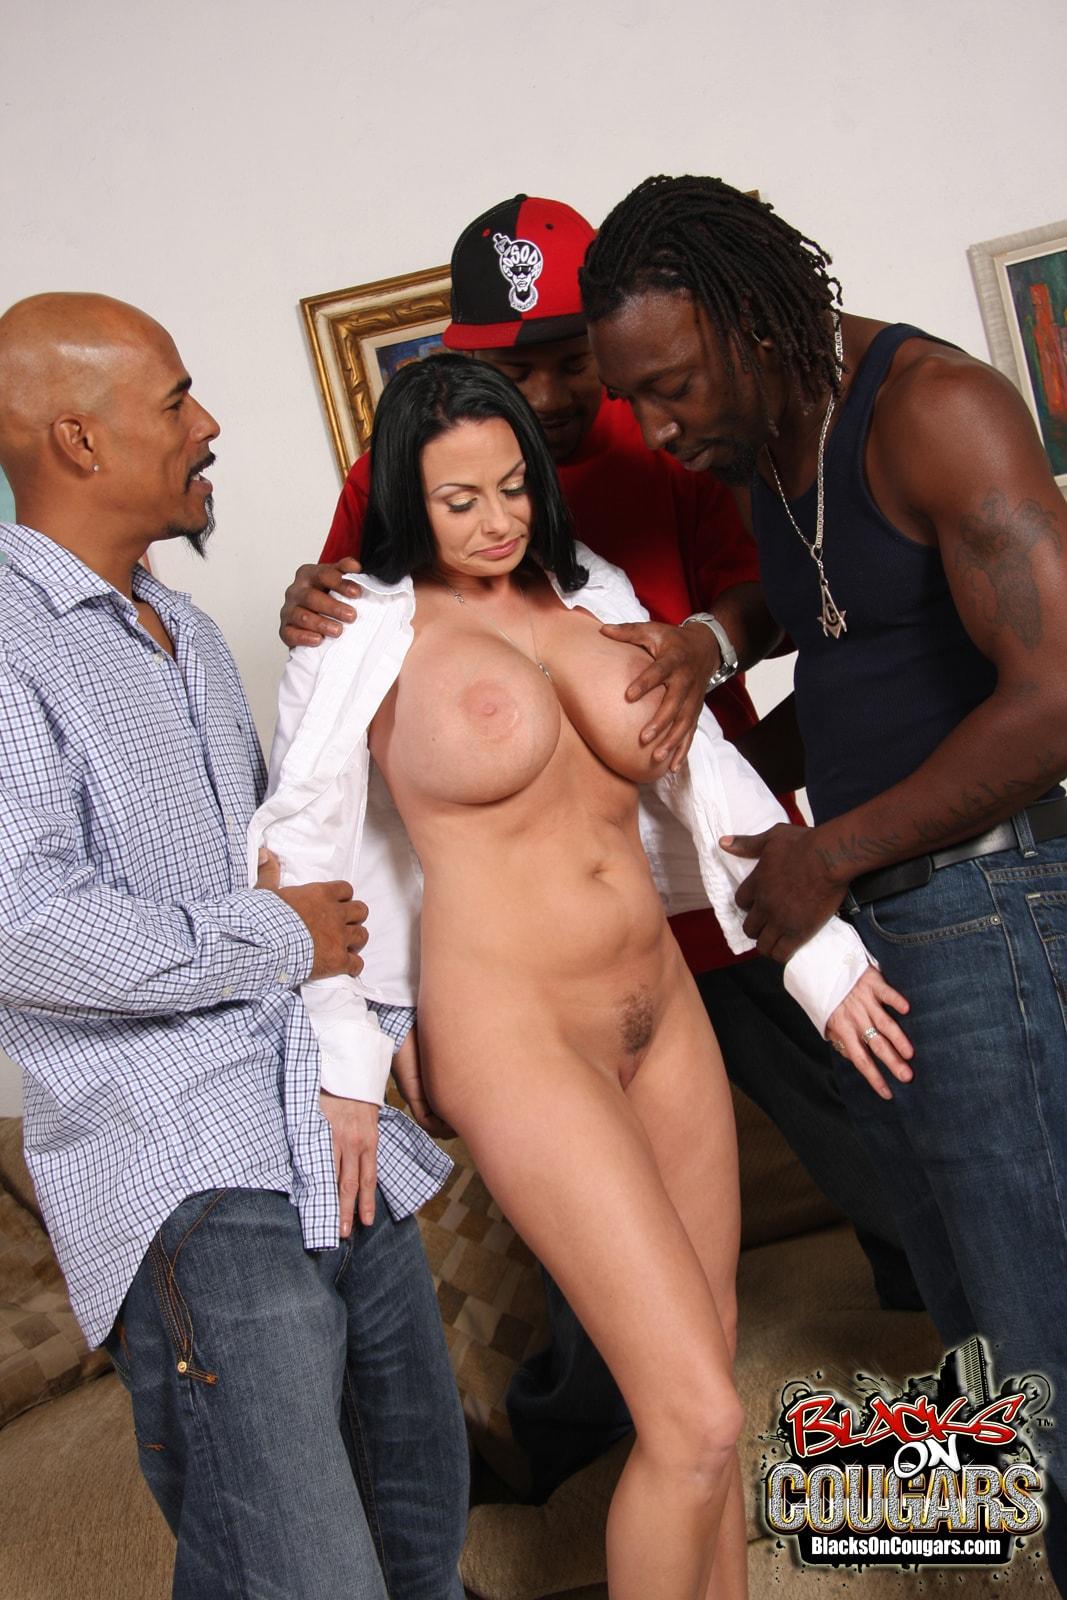 Dogfart '- Blacks On Cougars' starring Harley Raines (Photo 12)